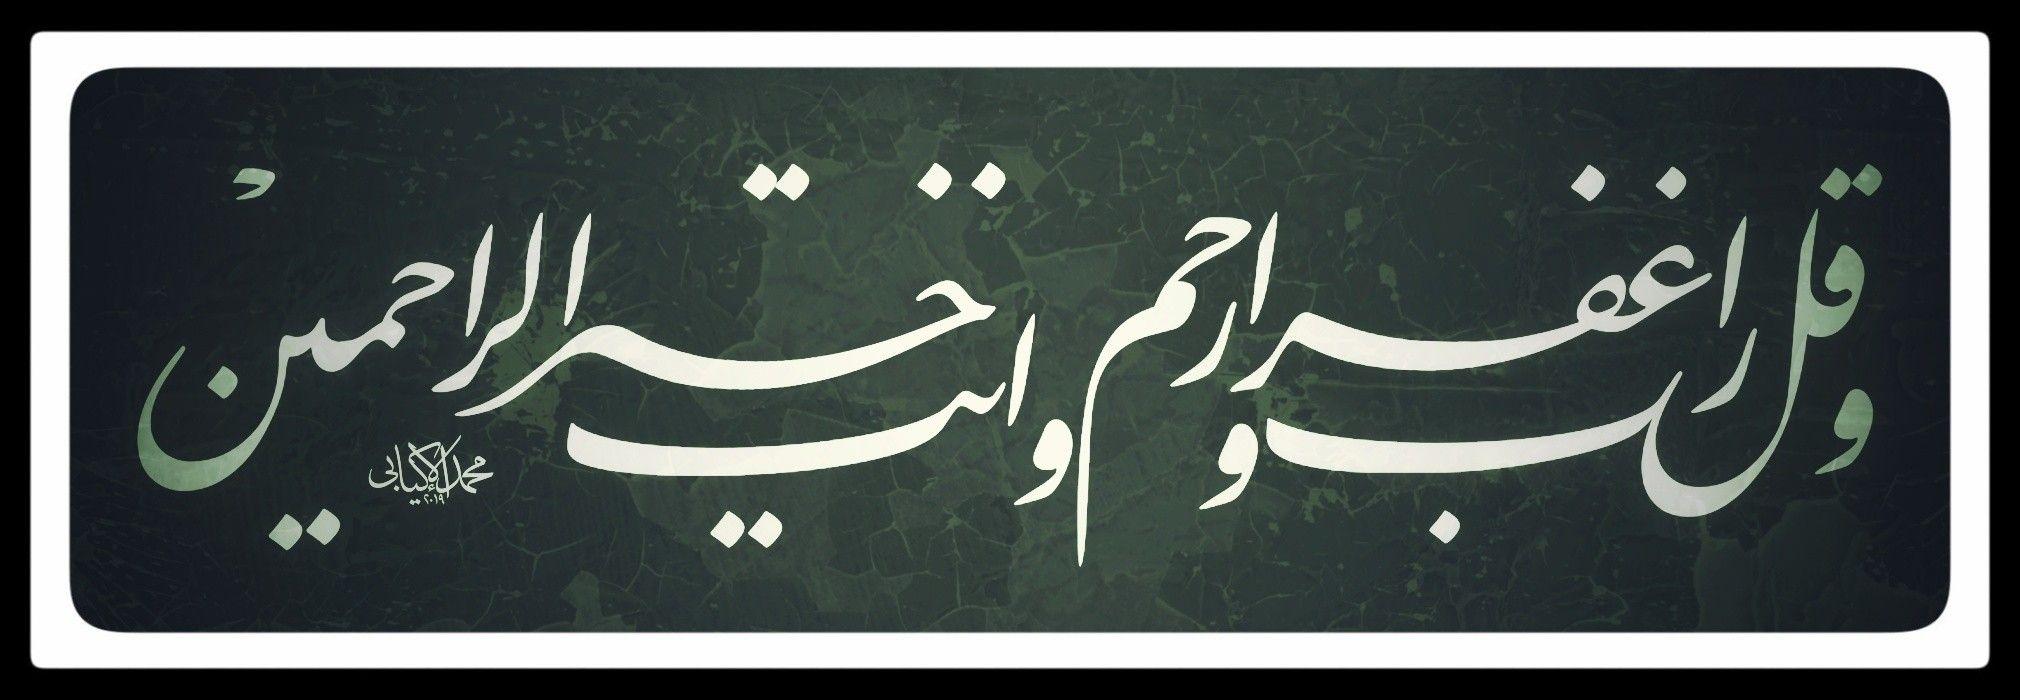 وقل رب اغفر وارحم وانت خير الراحمين Calligraphy Arabic Calligraphy Arabic